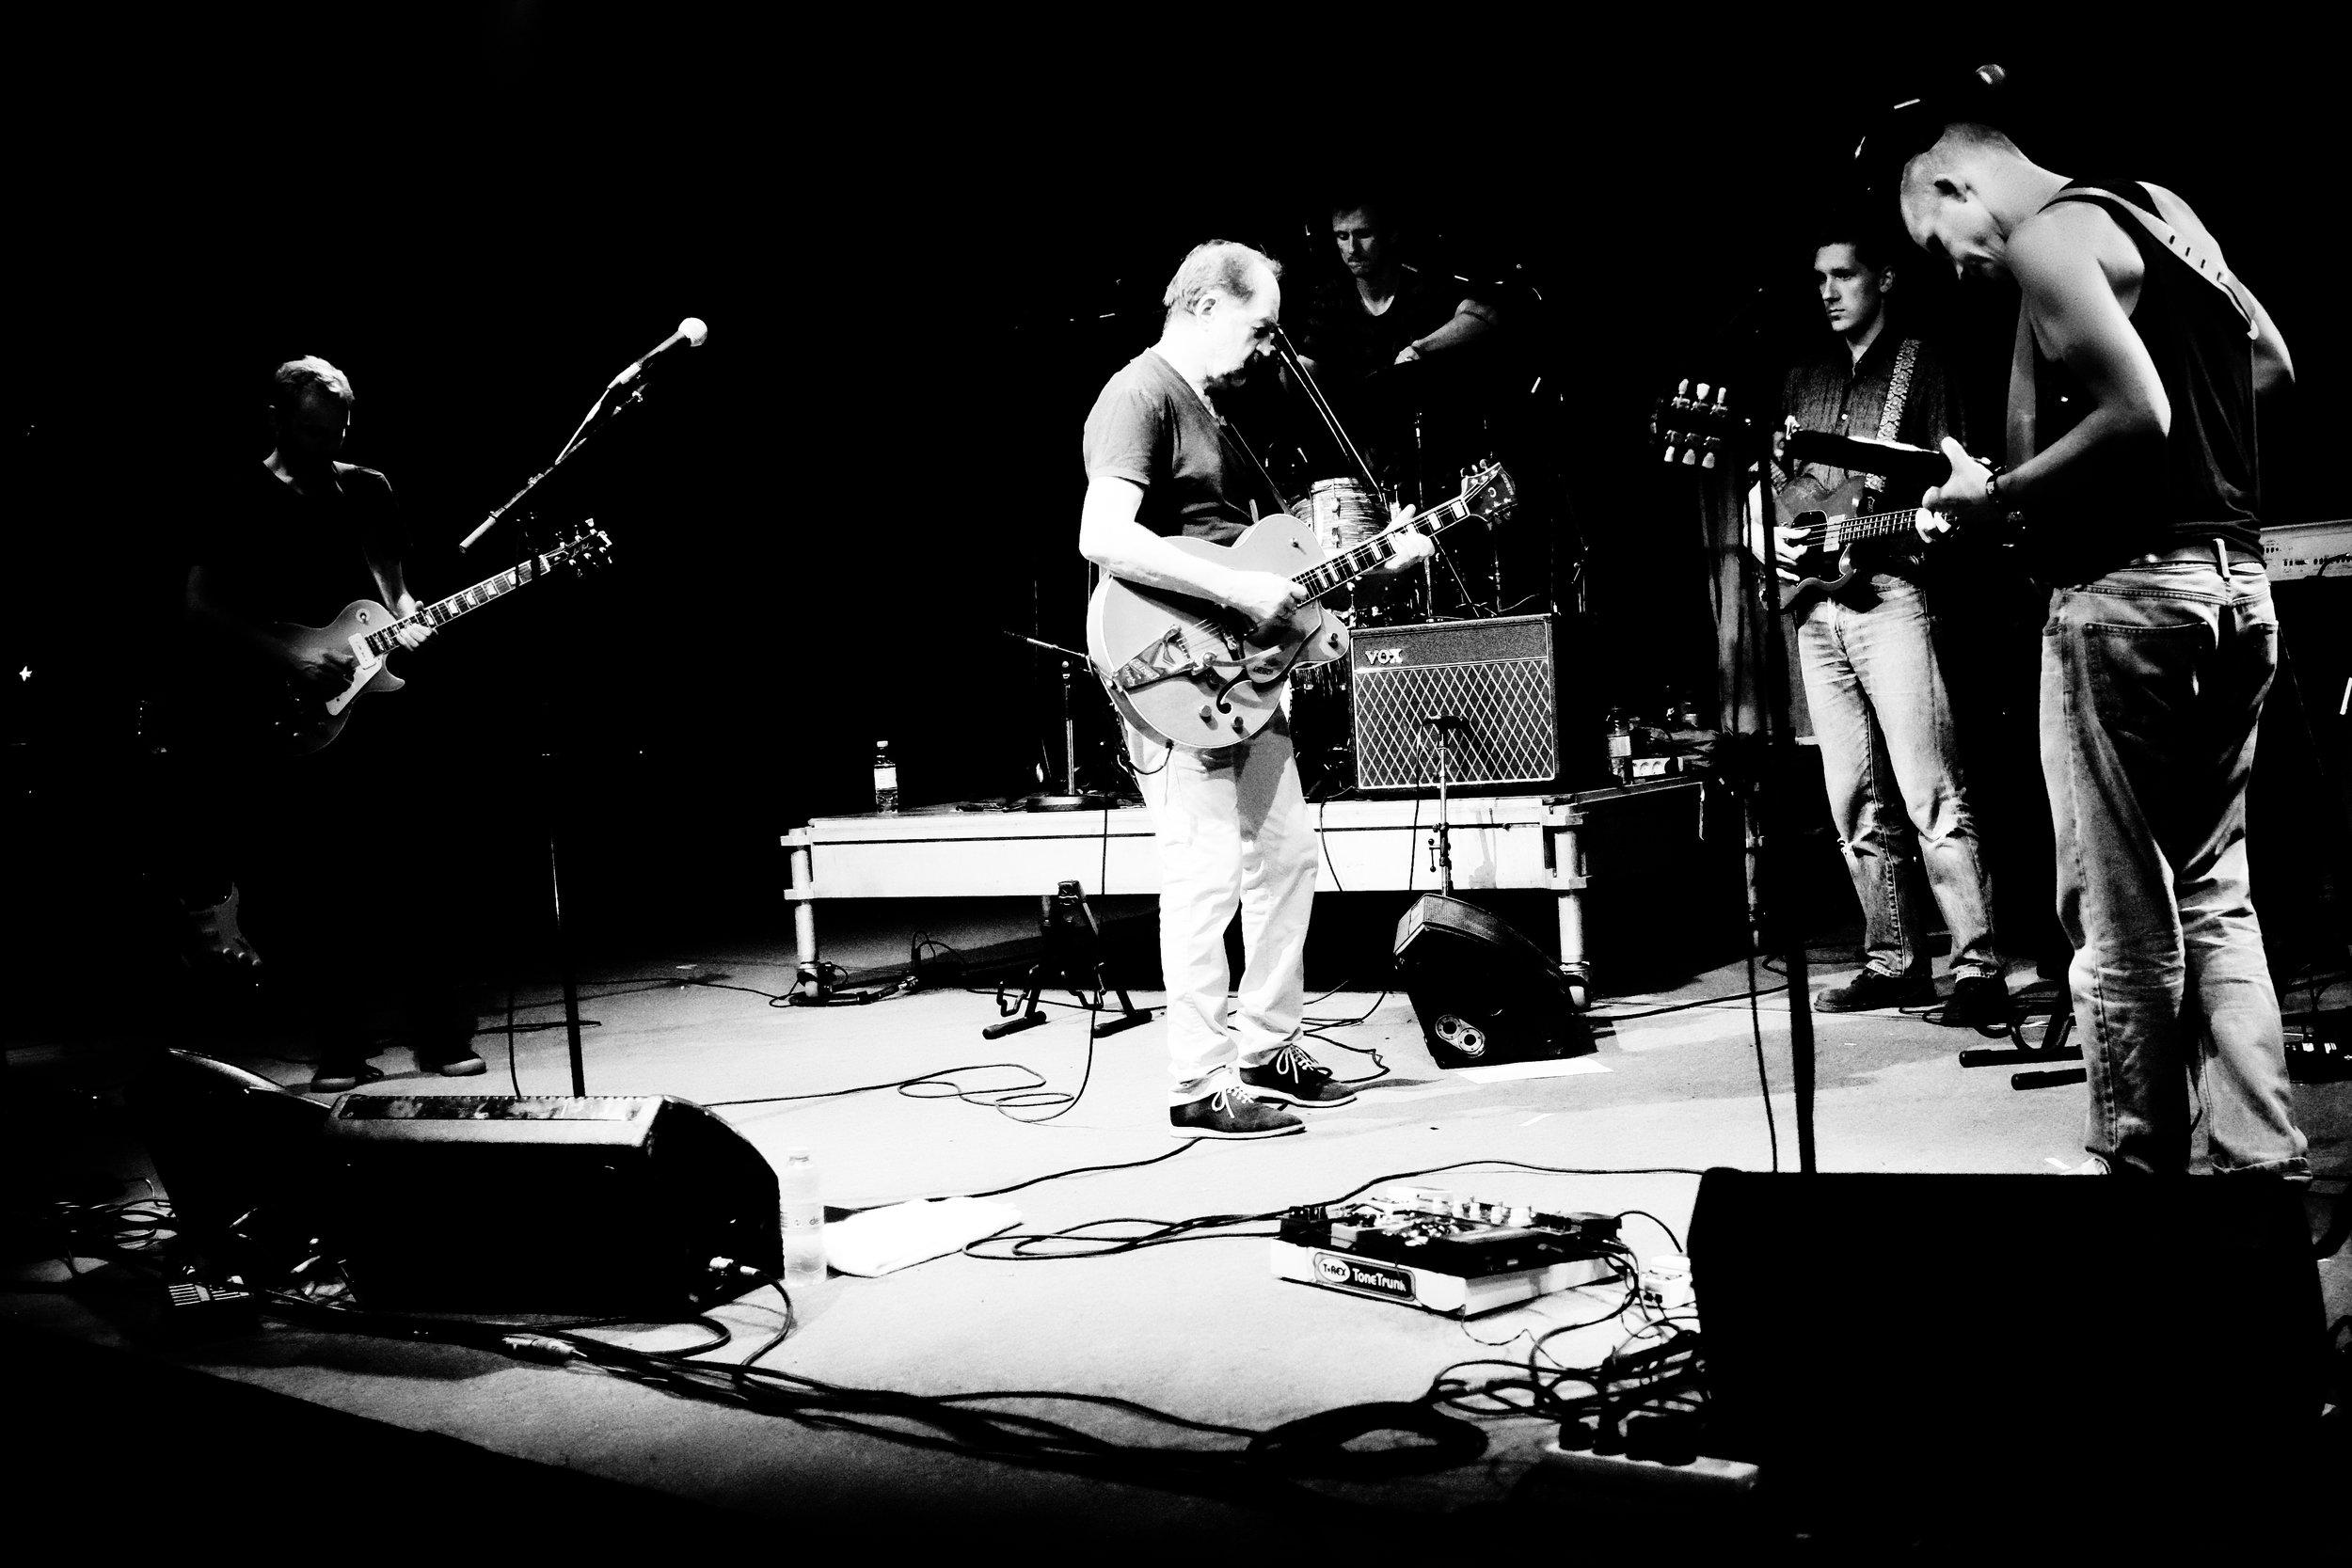 Nils Skousen Band